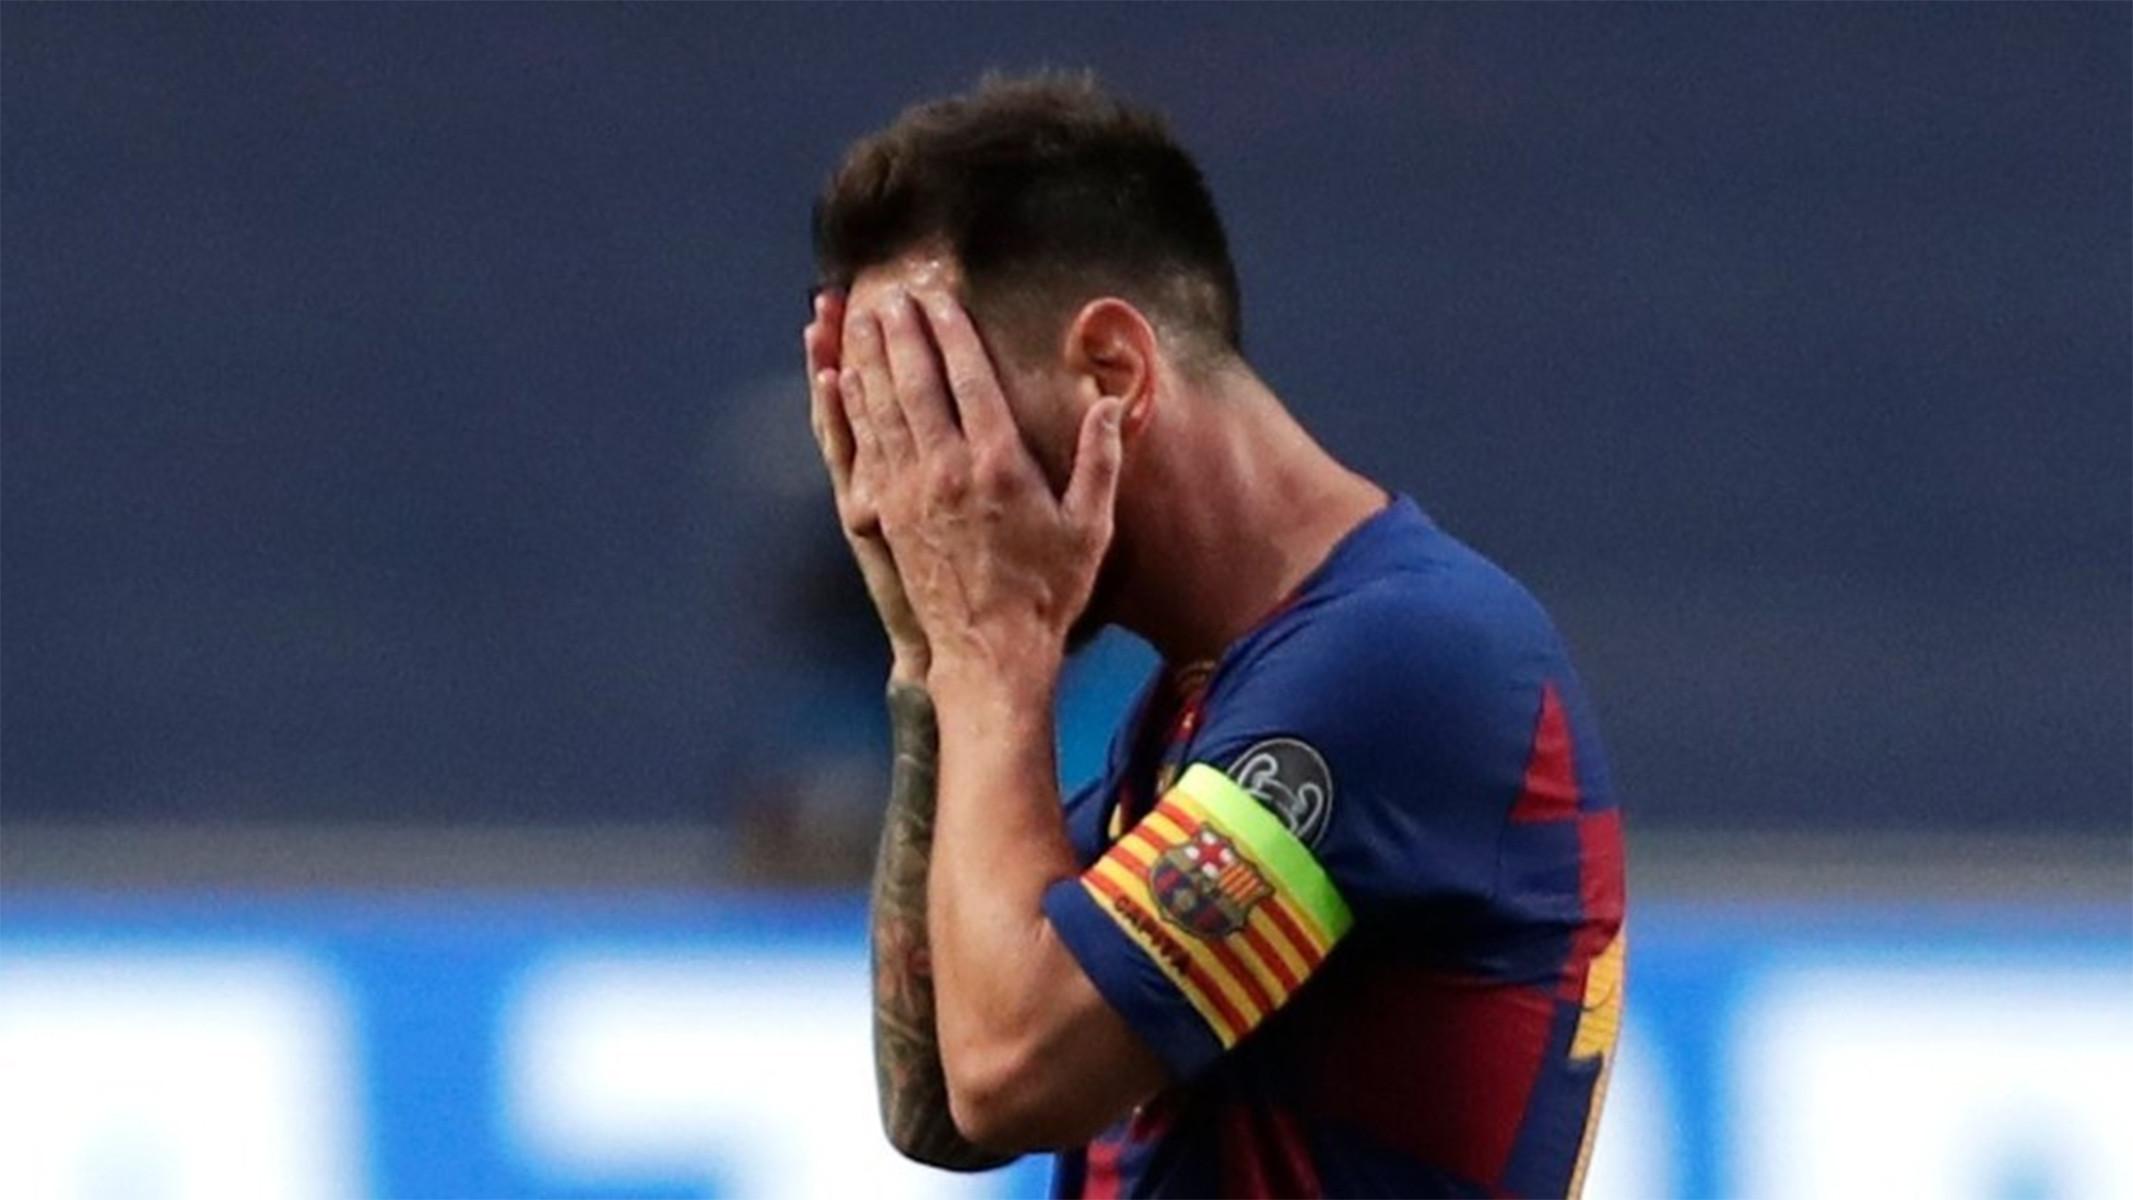 Begini Kondisi Messi Usai Barcelona Dihancurkan Bayern Muenchen 2-8 - JPNN.com